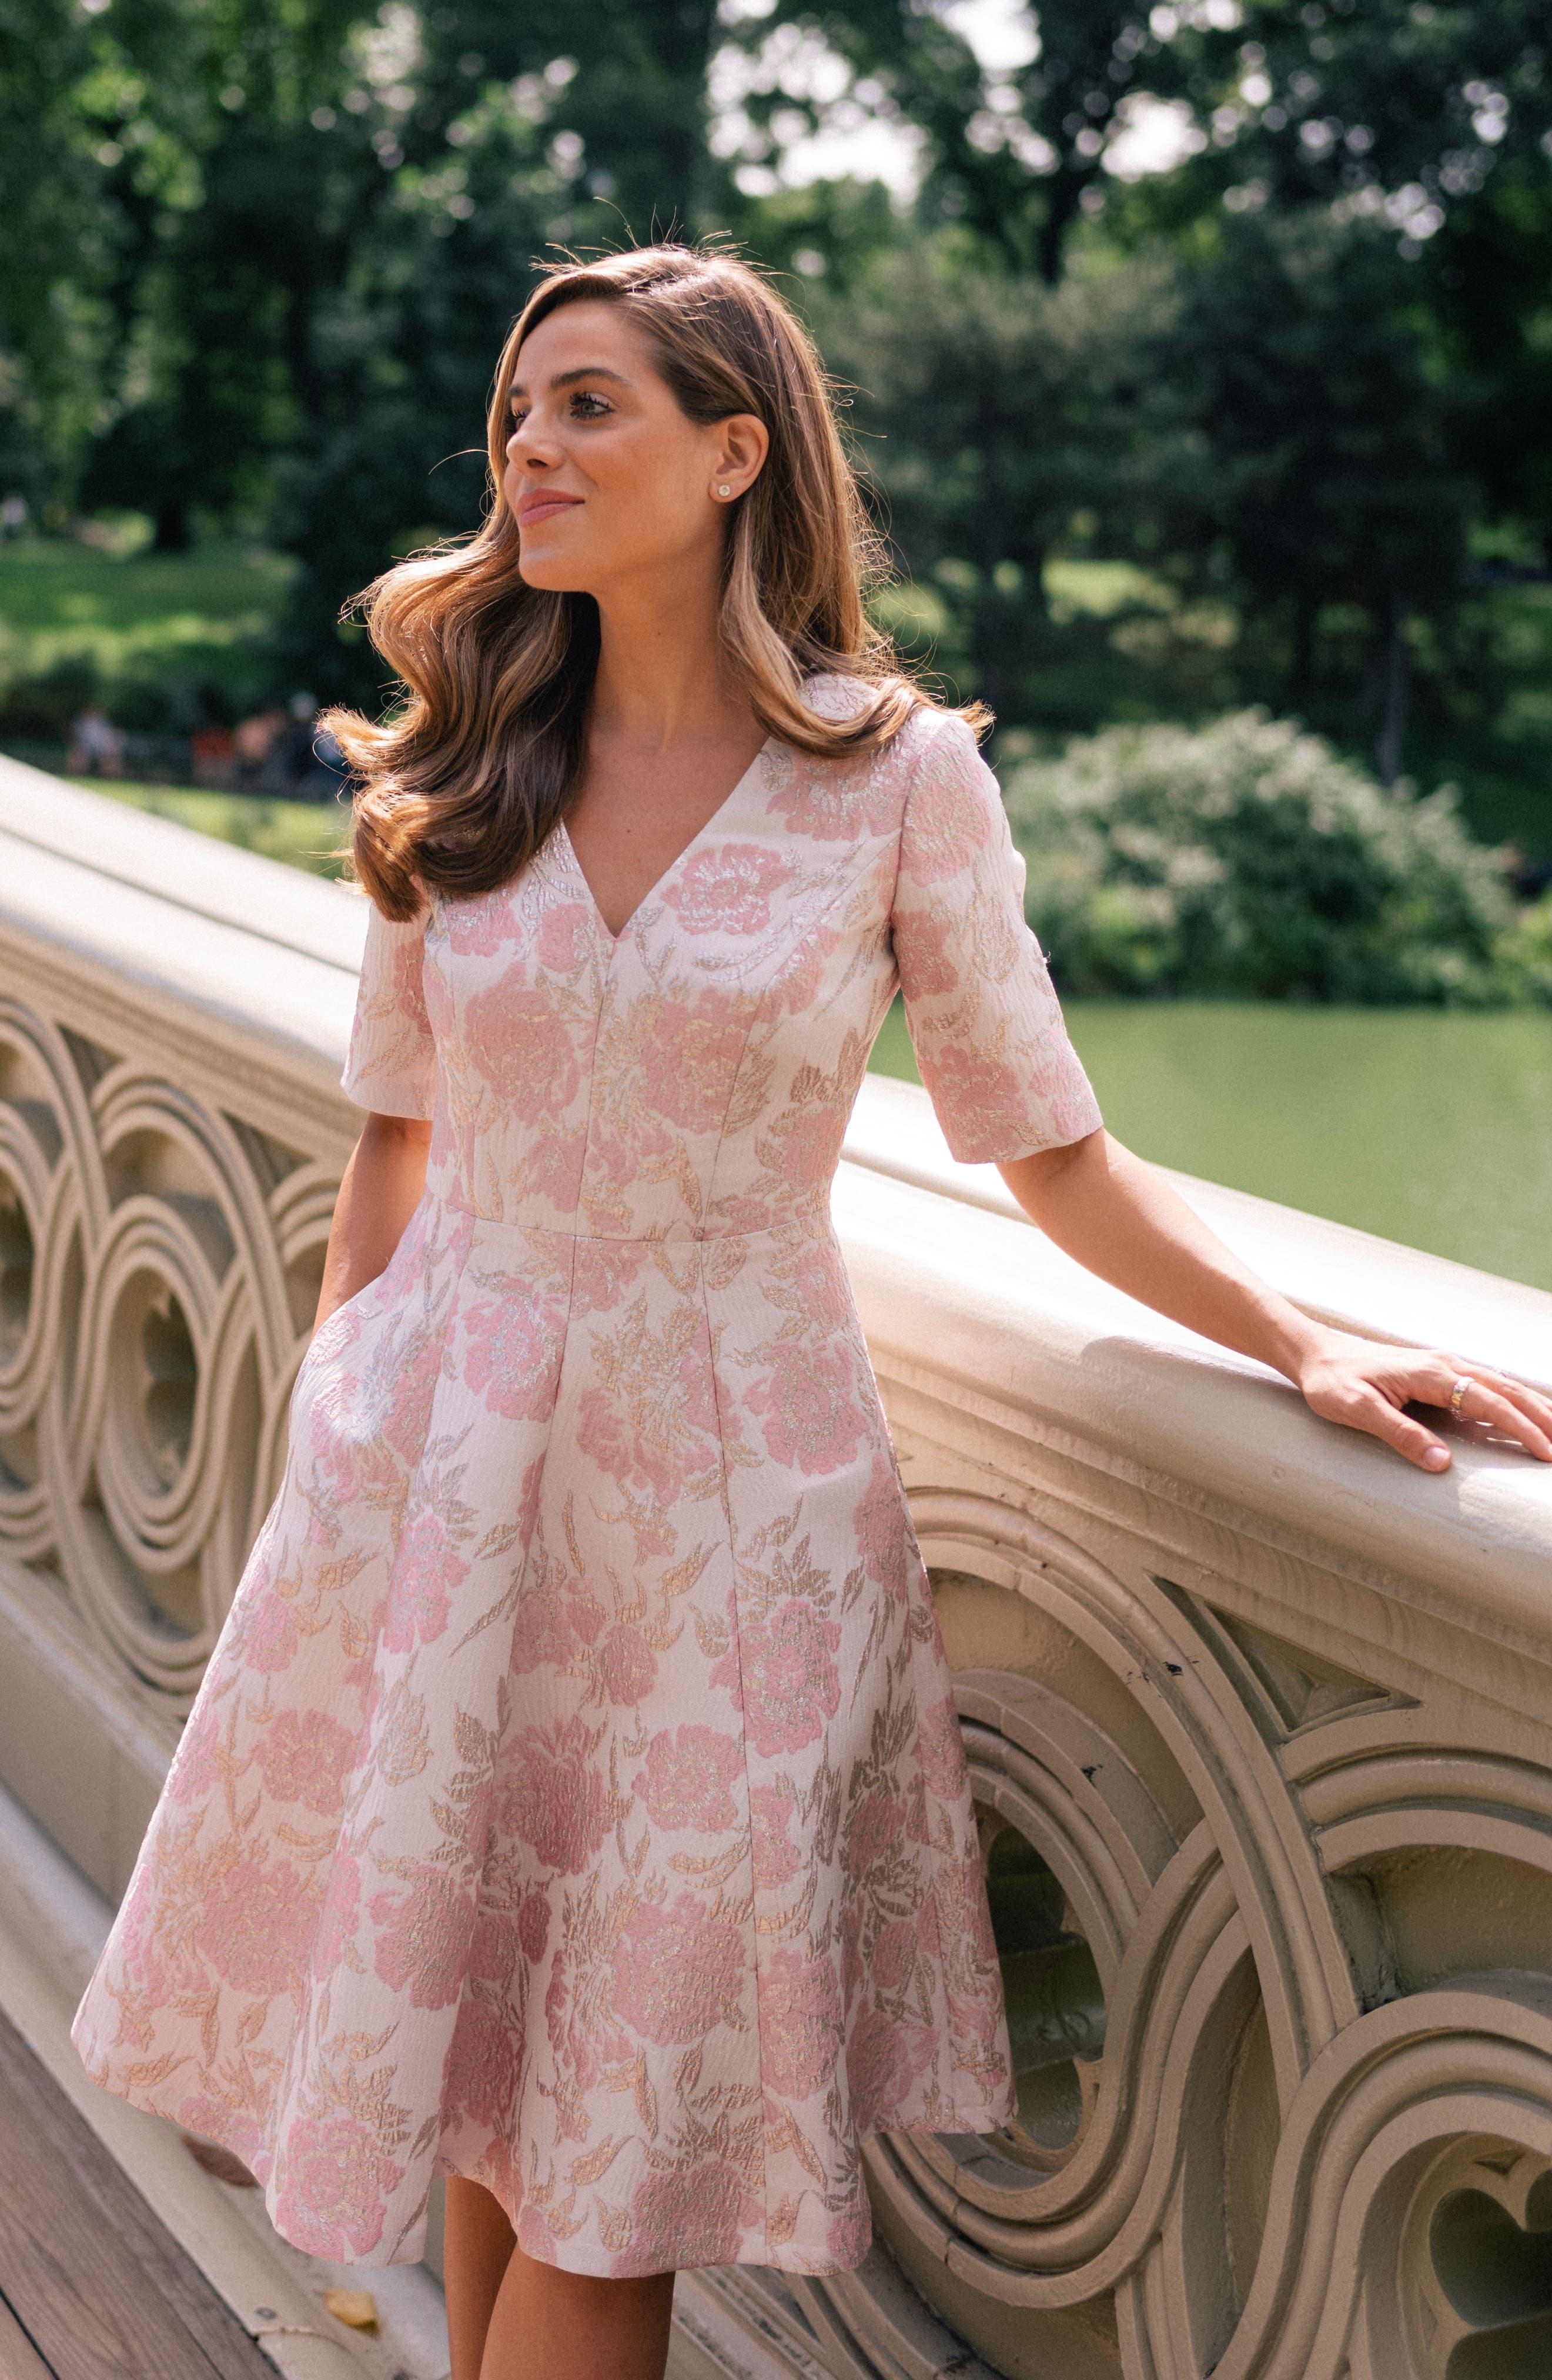 Adair Pink Passion Rose Jacquard Fit & Flare Dress,                             Alternate thumbnail 9, color,                             PINK PEARL